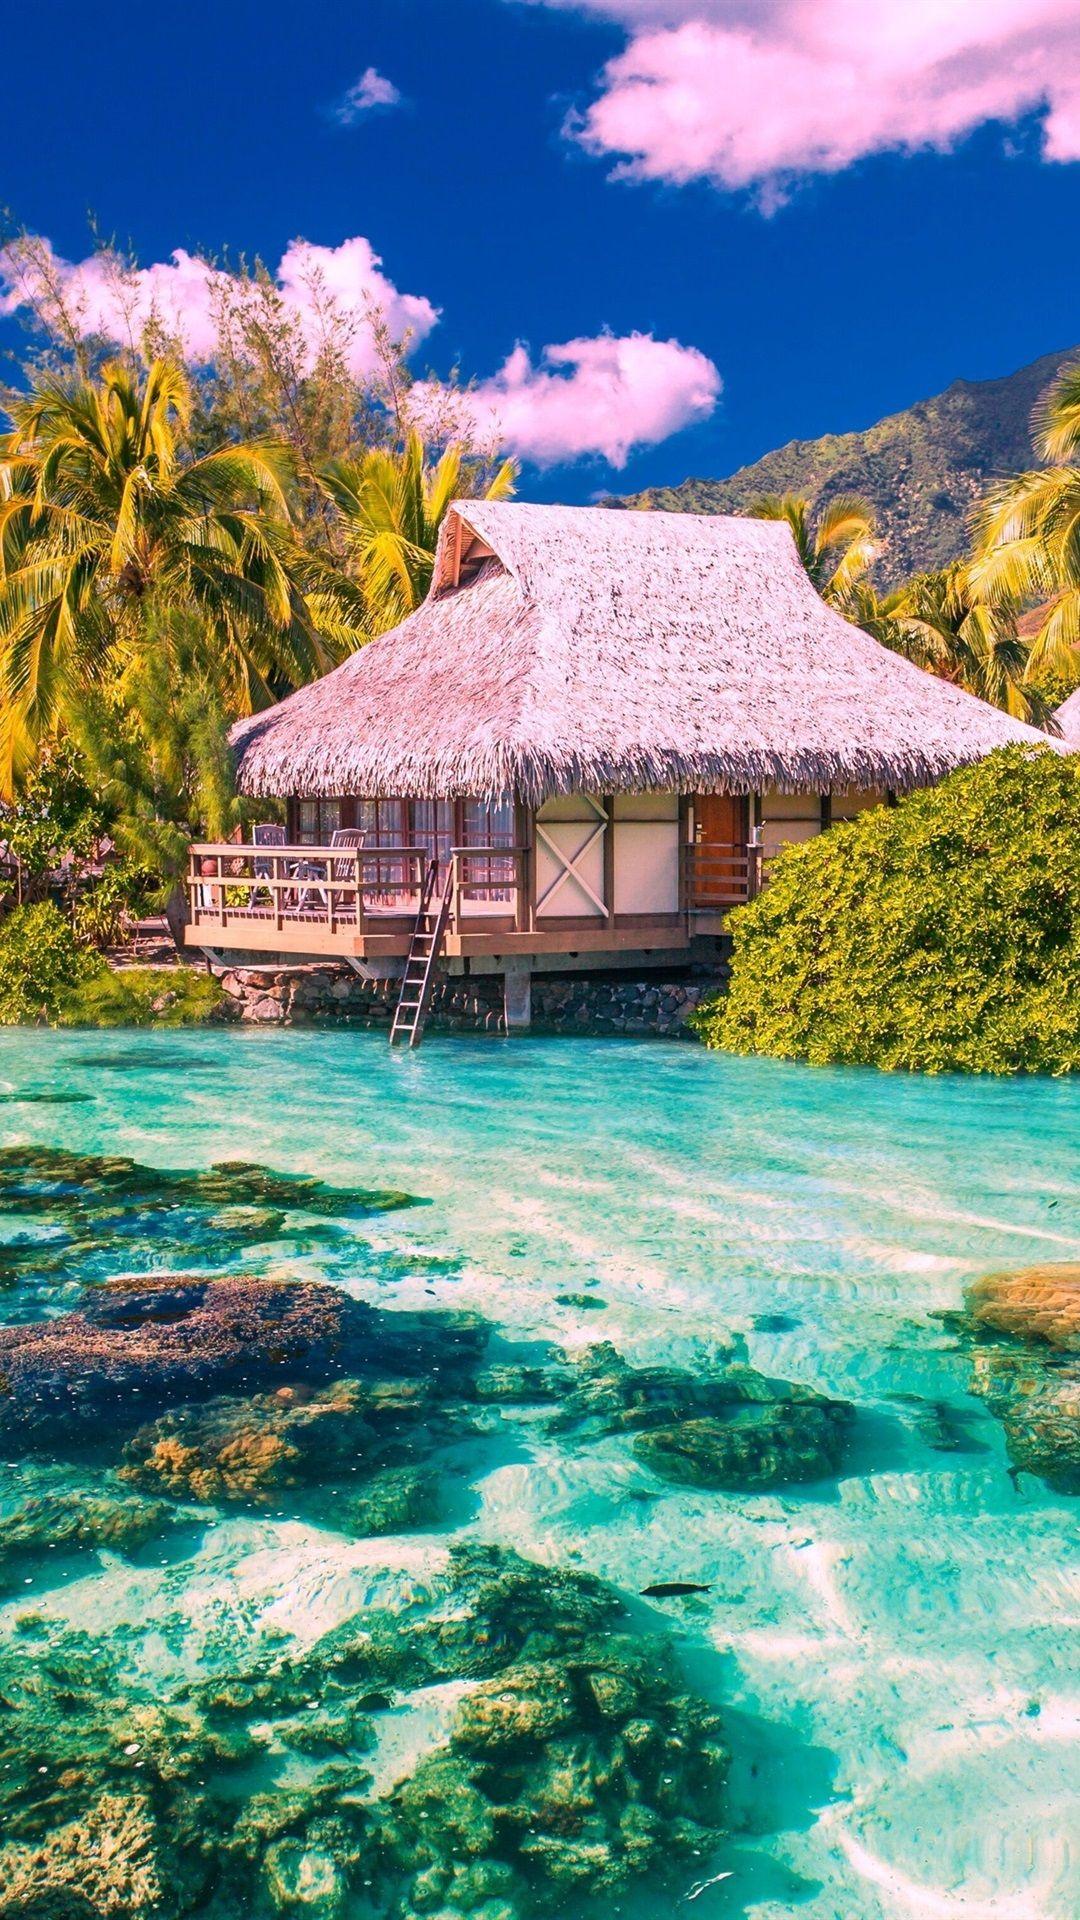 The Maldives Vertical Photo